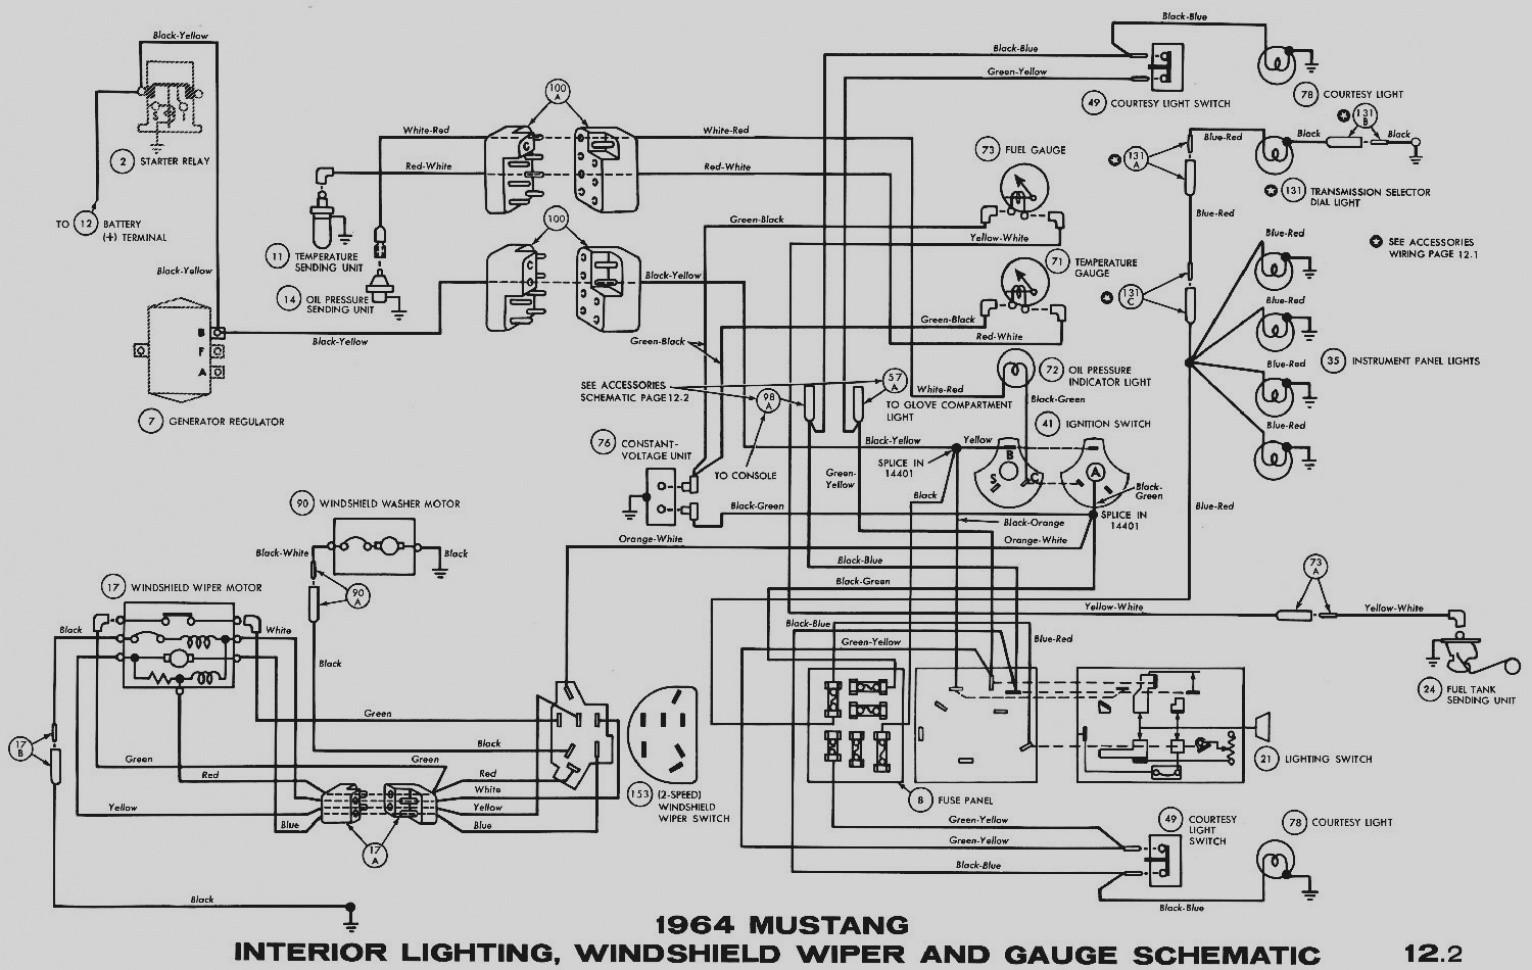 47re Wiring Diagram Get Free Image About Wiring Diagram